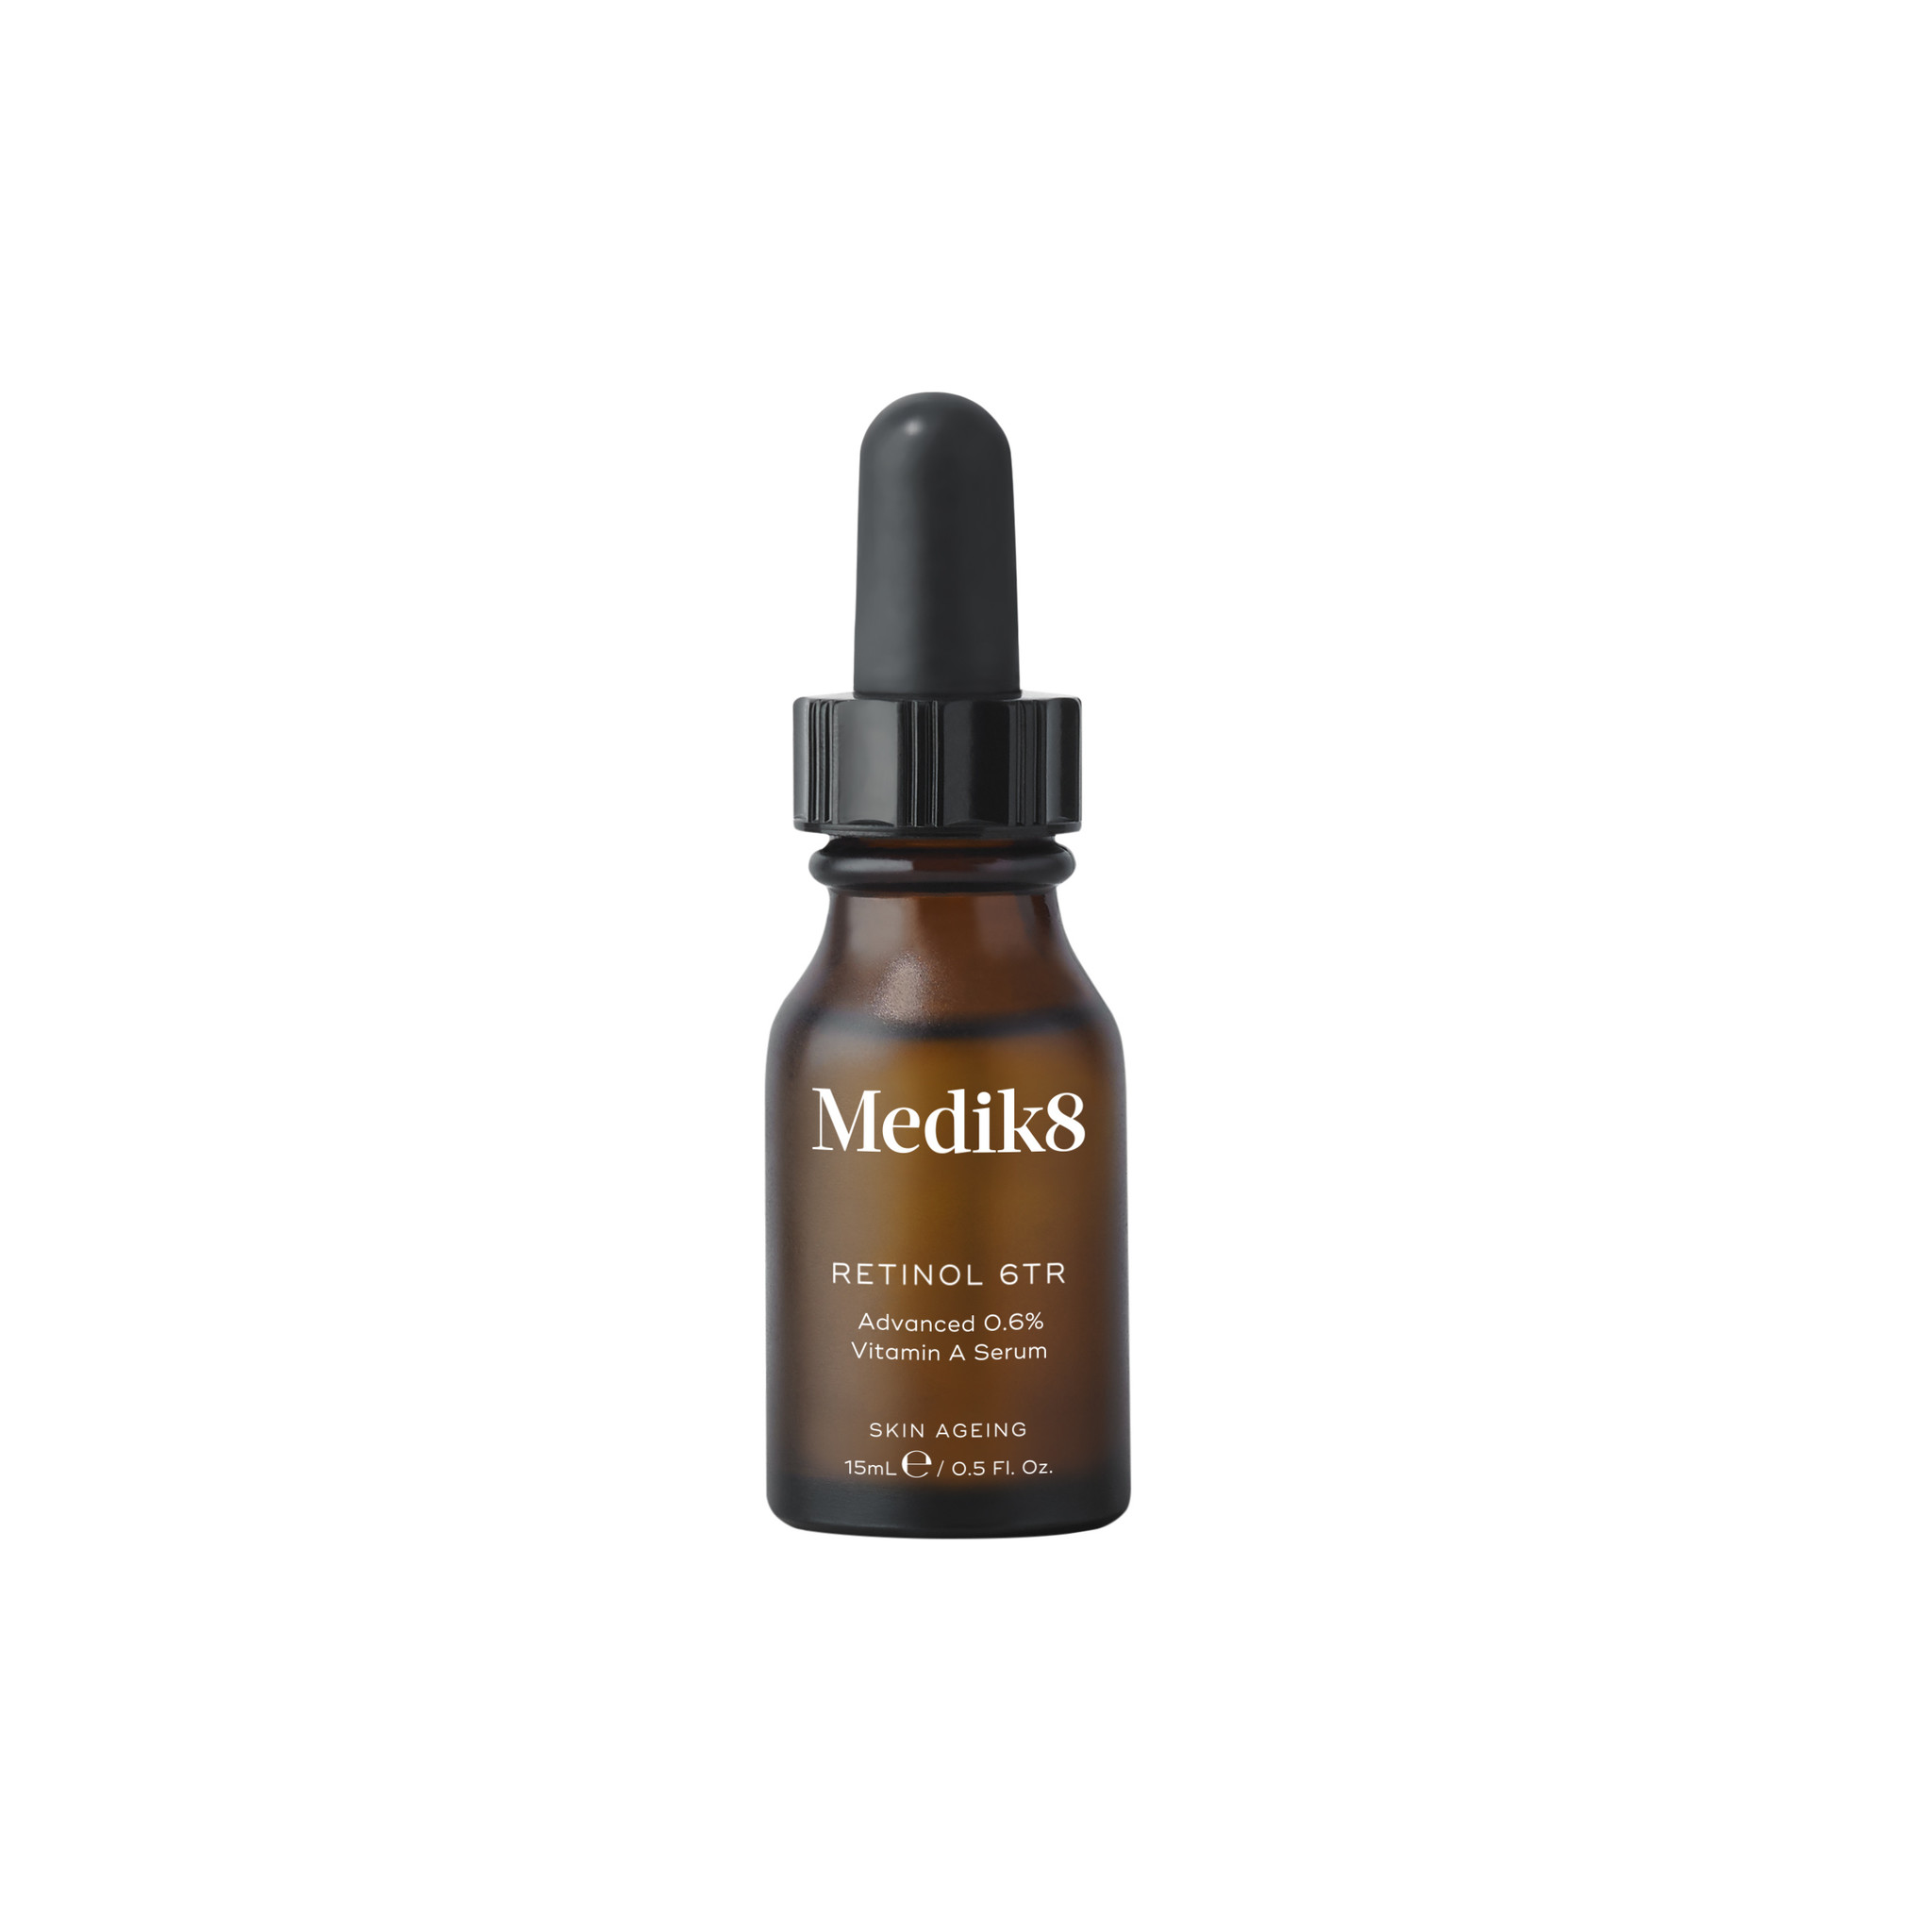 Medik8 Medik8 Retinol 6TR serum 15ml